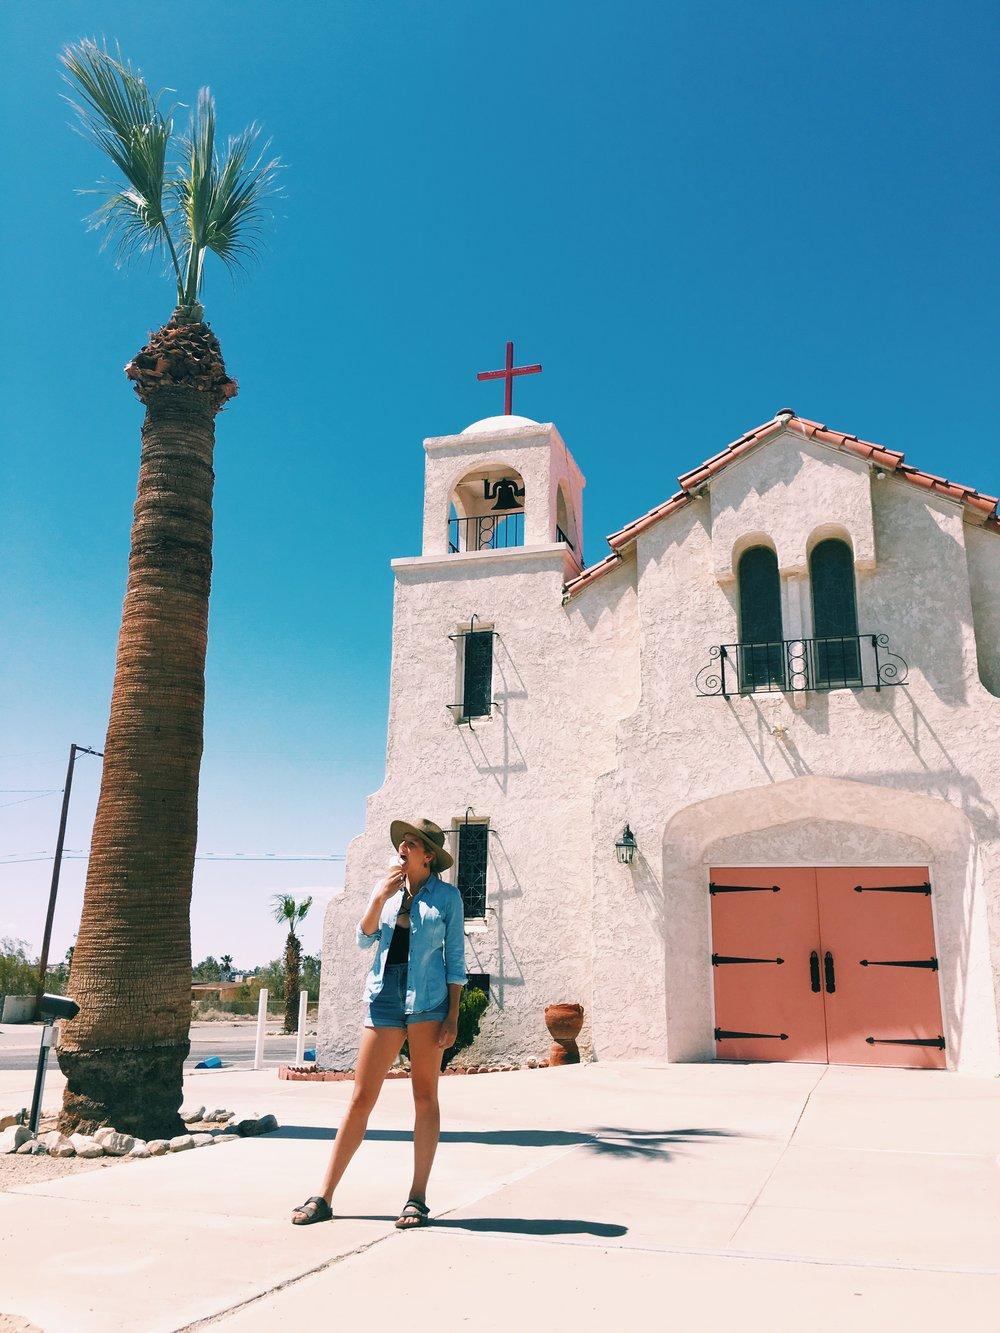 twentynine-palms-church